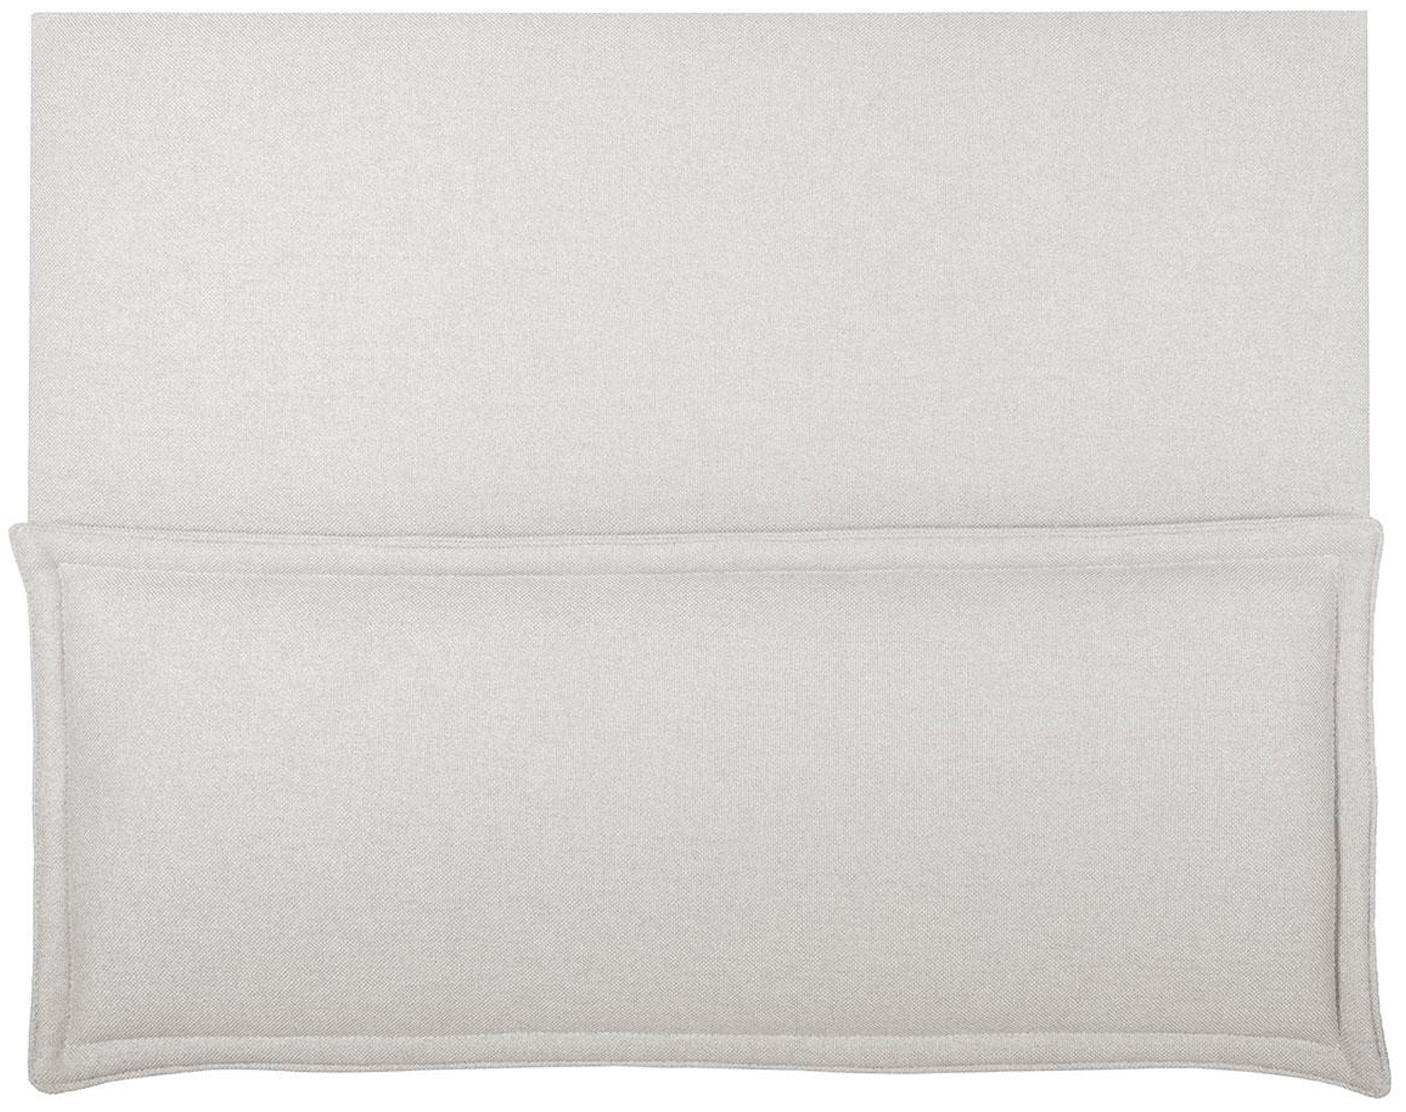 Cabecero Comfort, Estructura: madera de pino, madera co, Tapizado: 100%poliéster Alta resis, Blanco crudo, An 100 x Al 80 cm